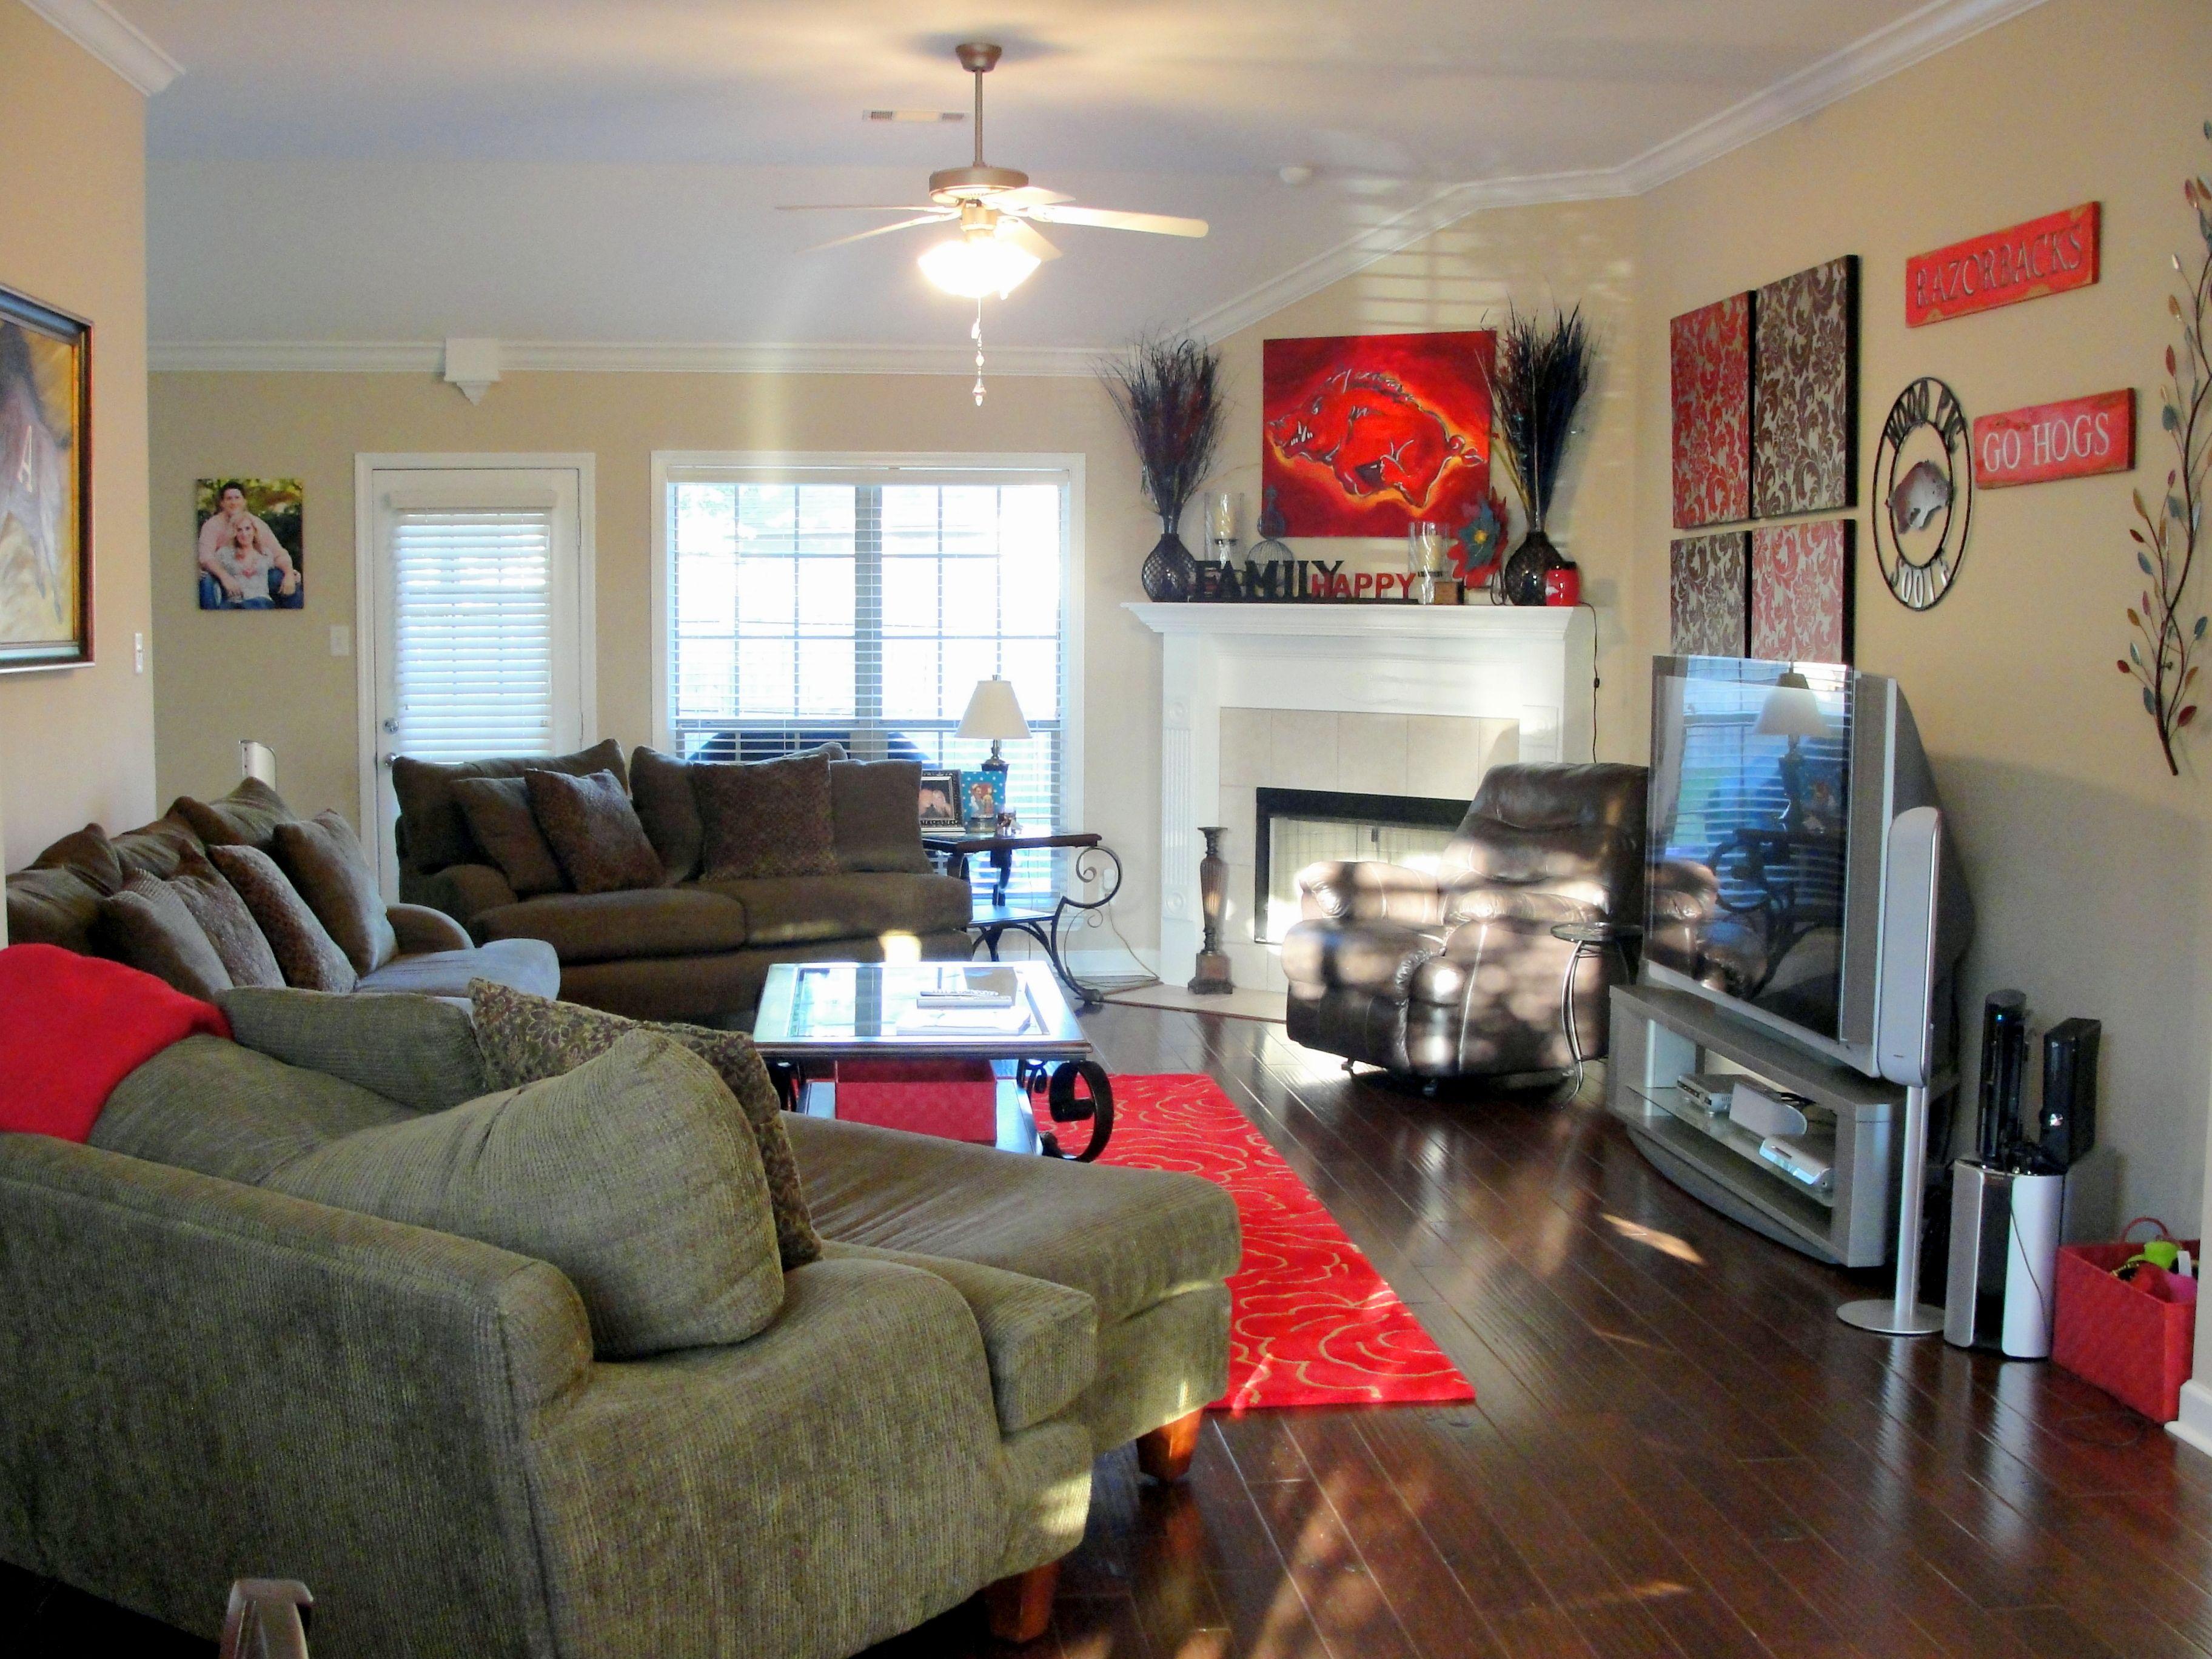 My Arkansas Razorbacks Themed Living Room